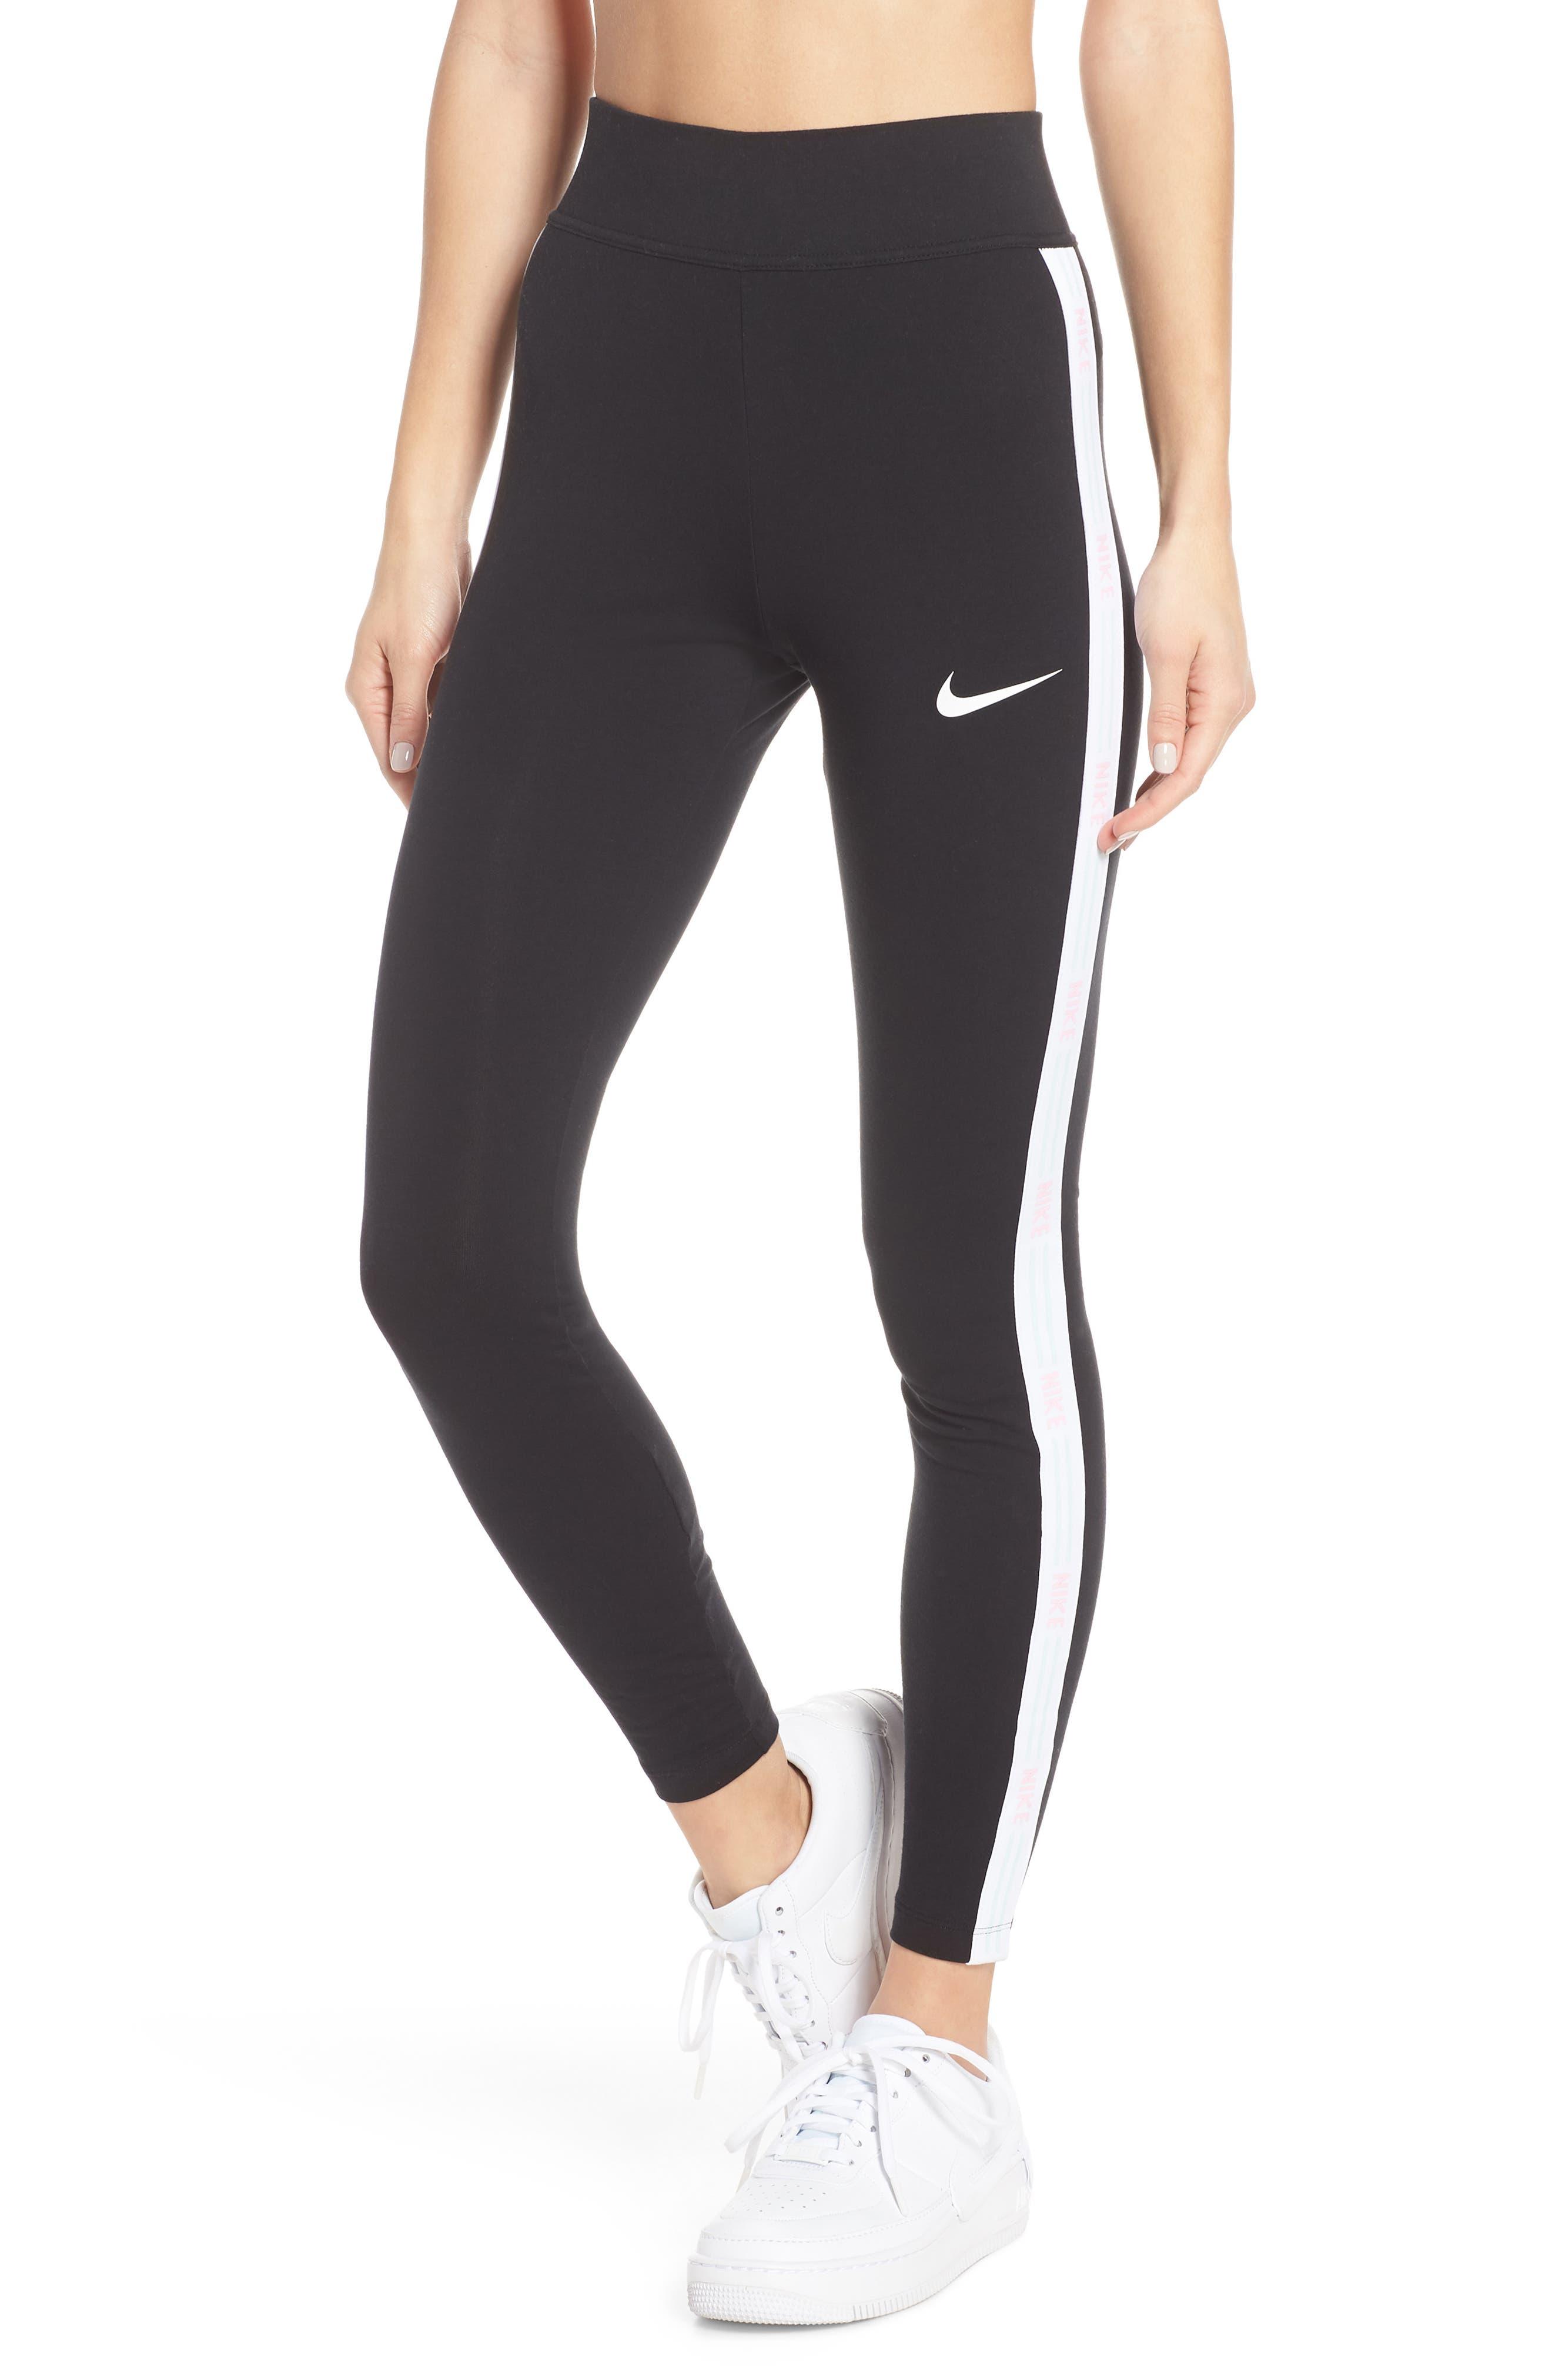 NIKE Sportswear Leggings, Main, color, 010